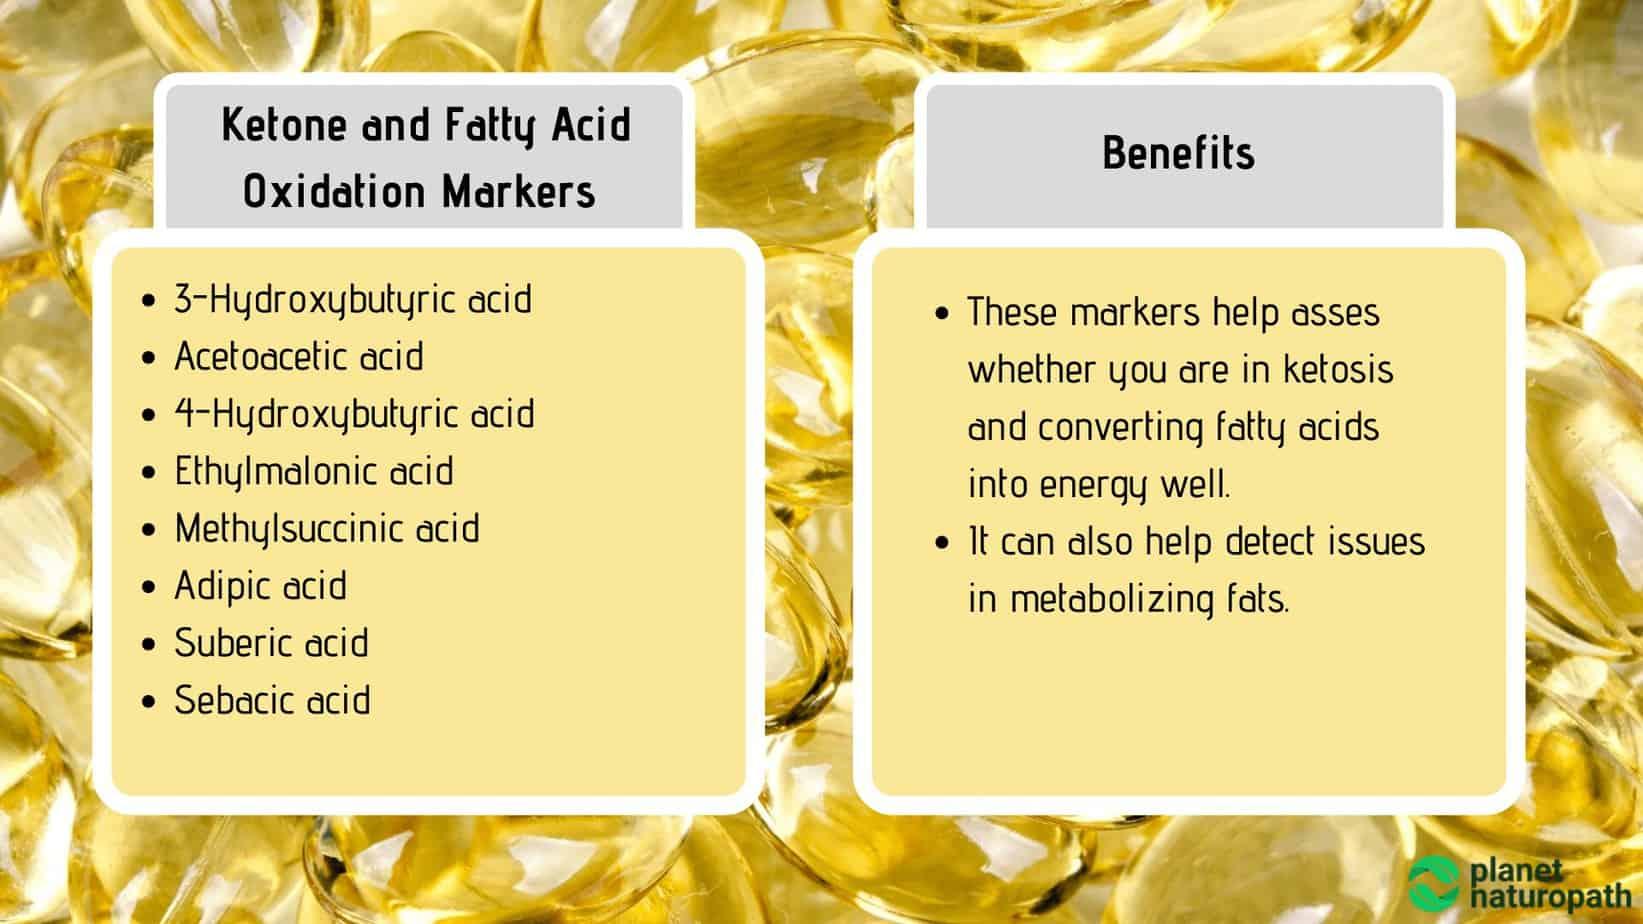 Ketone-and-Fatty-Acid-Oxidation-Markers